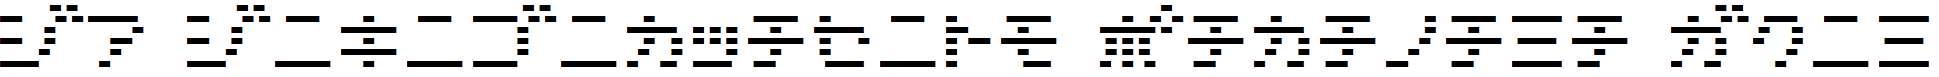 D3-DigiBitMapism-Katakana-Thin